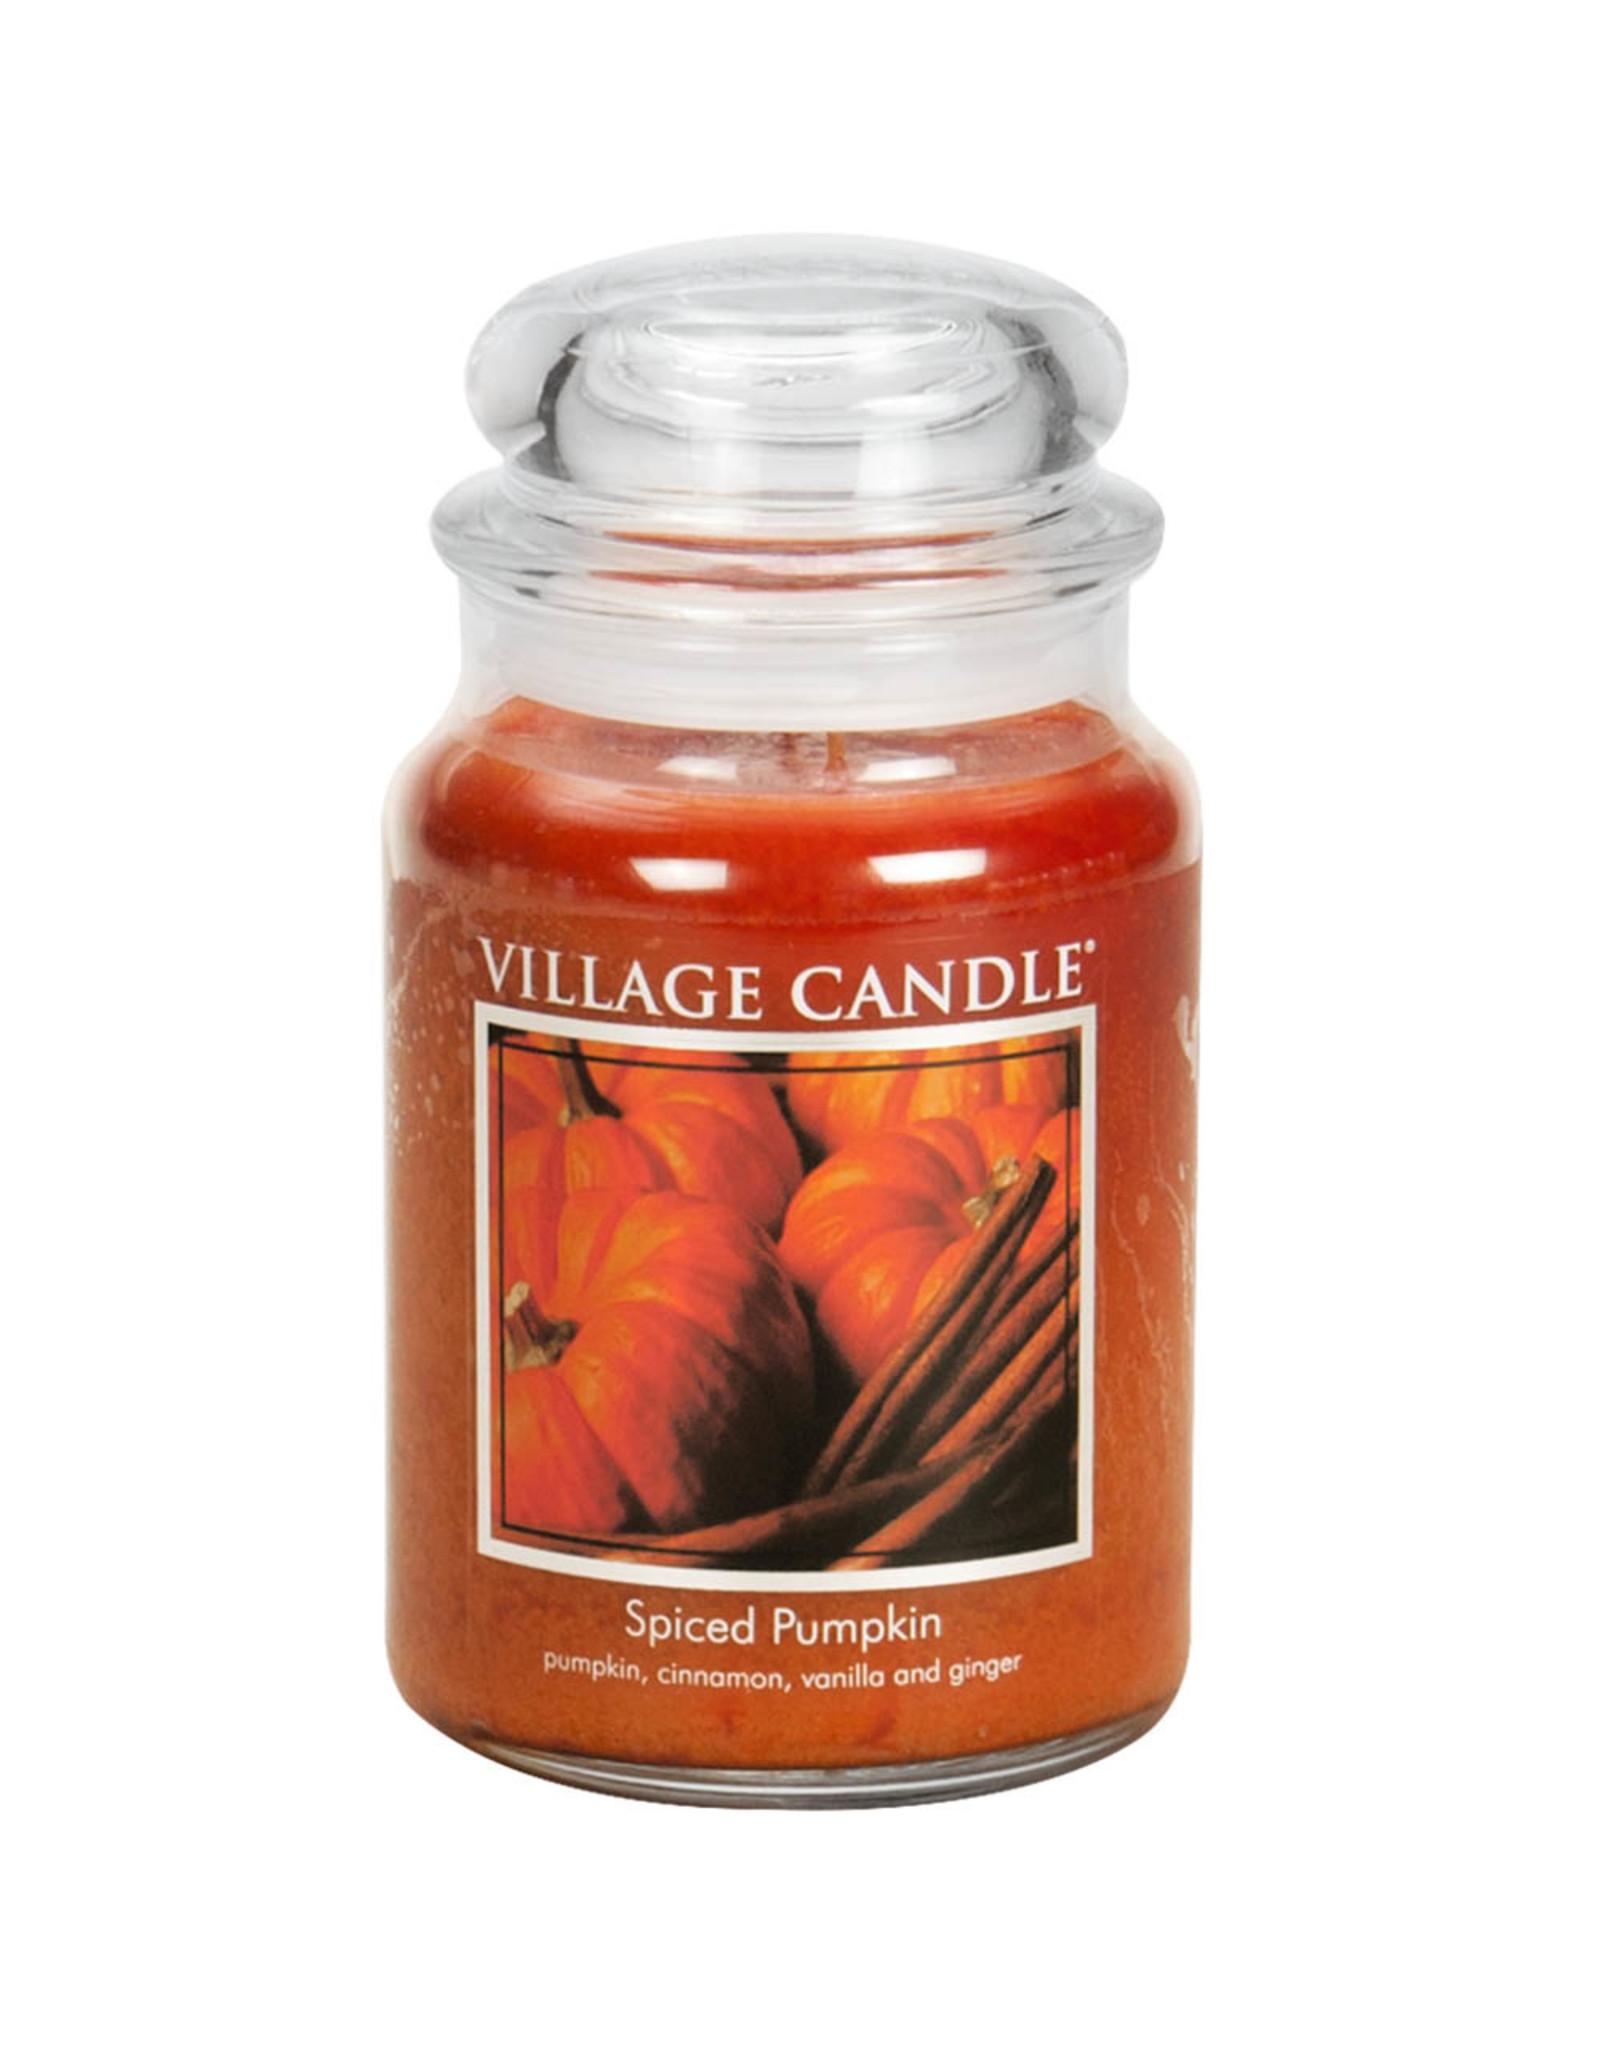 Village Candle SPICED PUMPKIN JAR CANDLE